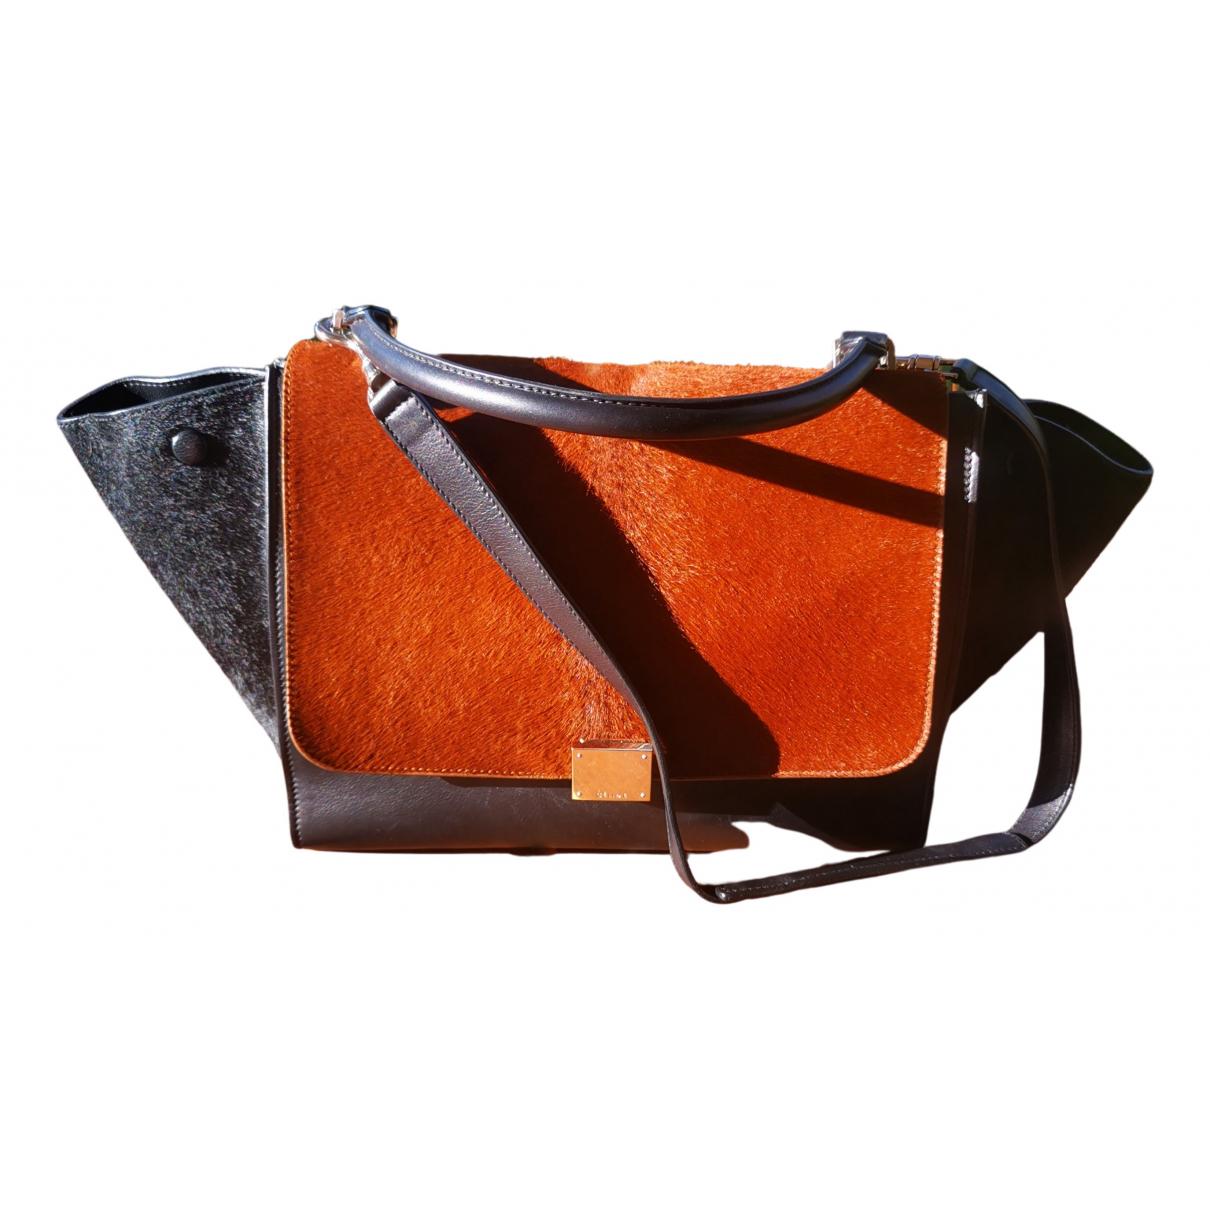 Celine Trapèze Black Pony-style calfskin handbag for Women N